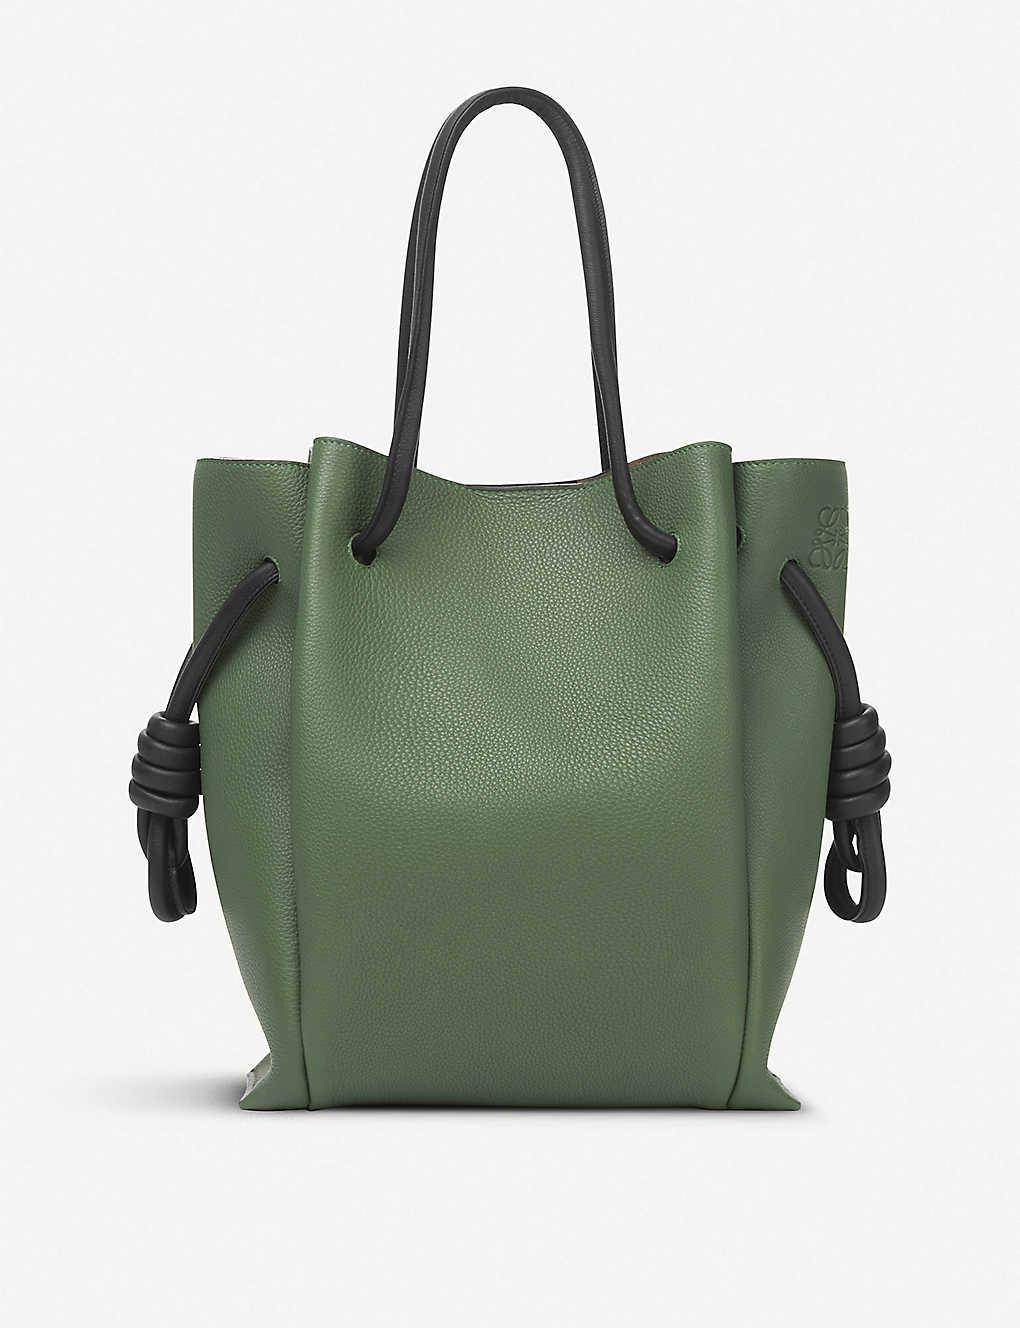 48966a252c17 LOEWE - Flamenco Knot small leather bag